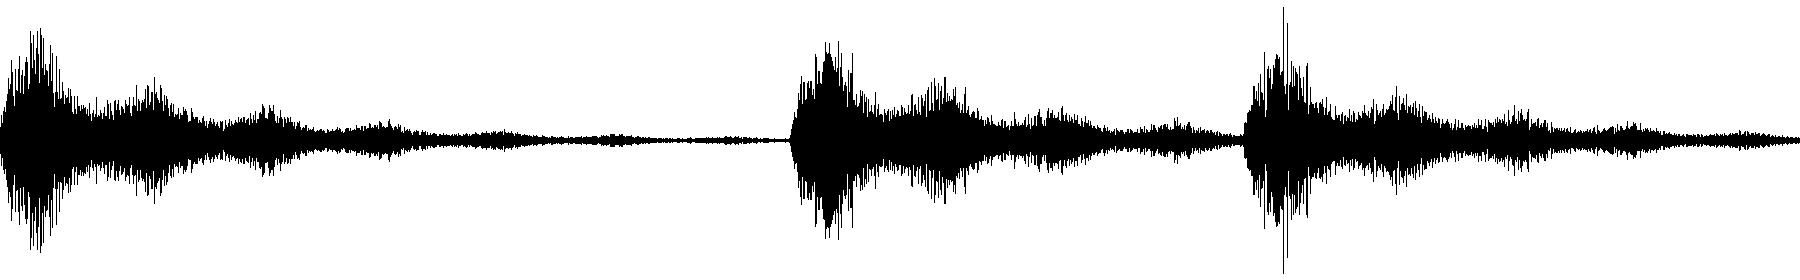 shs ch musicloop 127 epiano1 cm